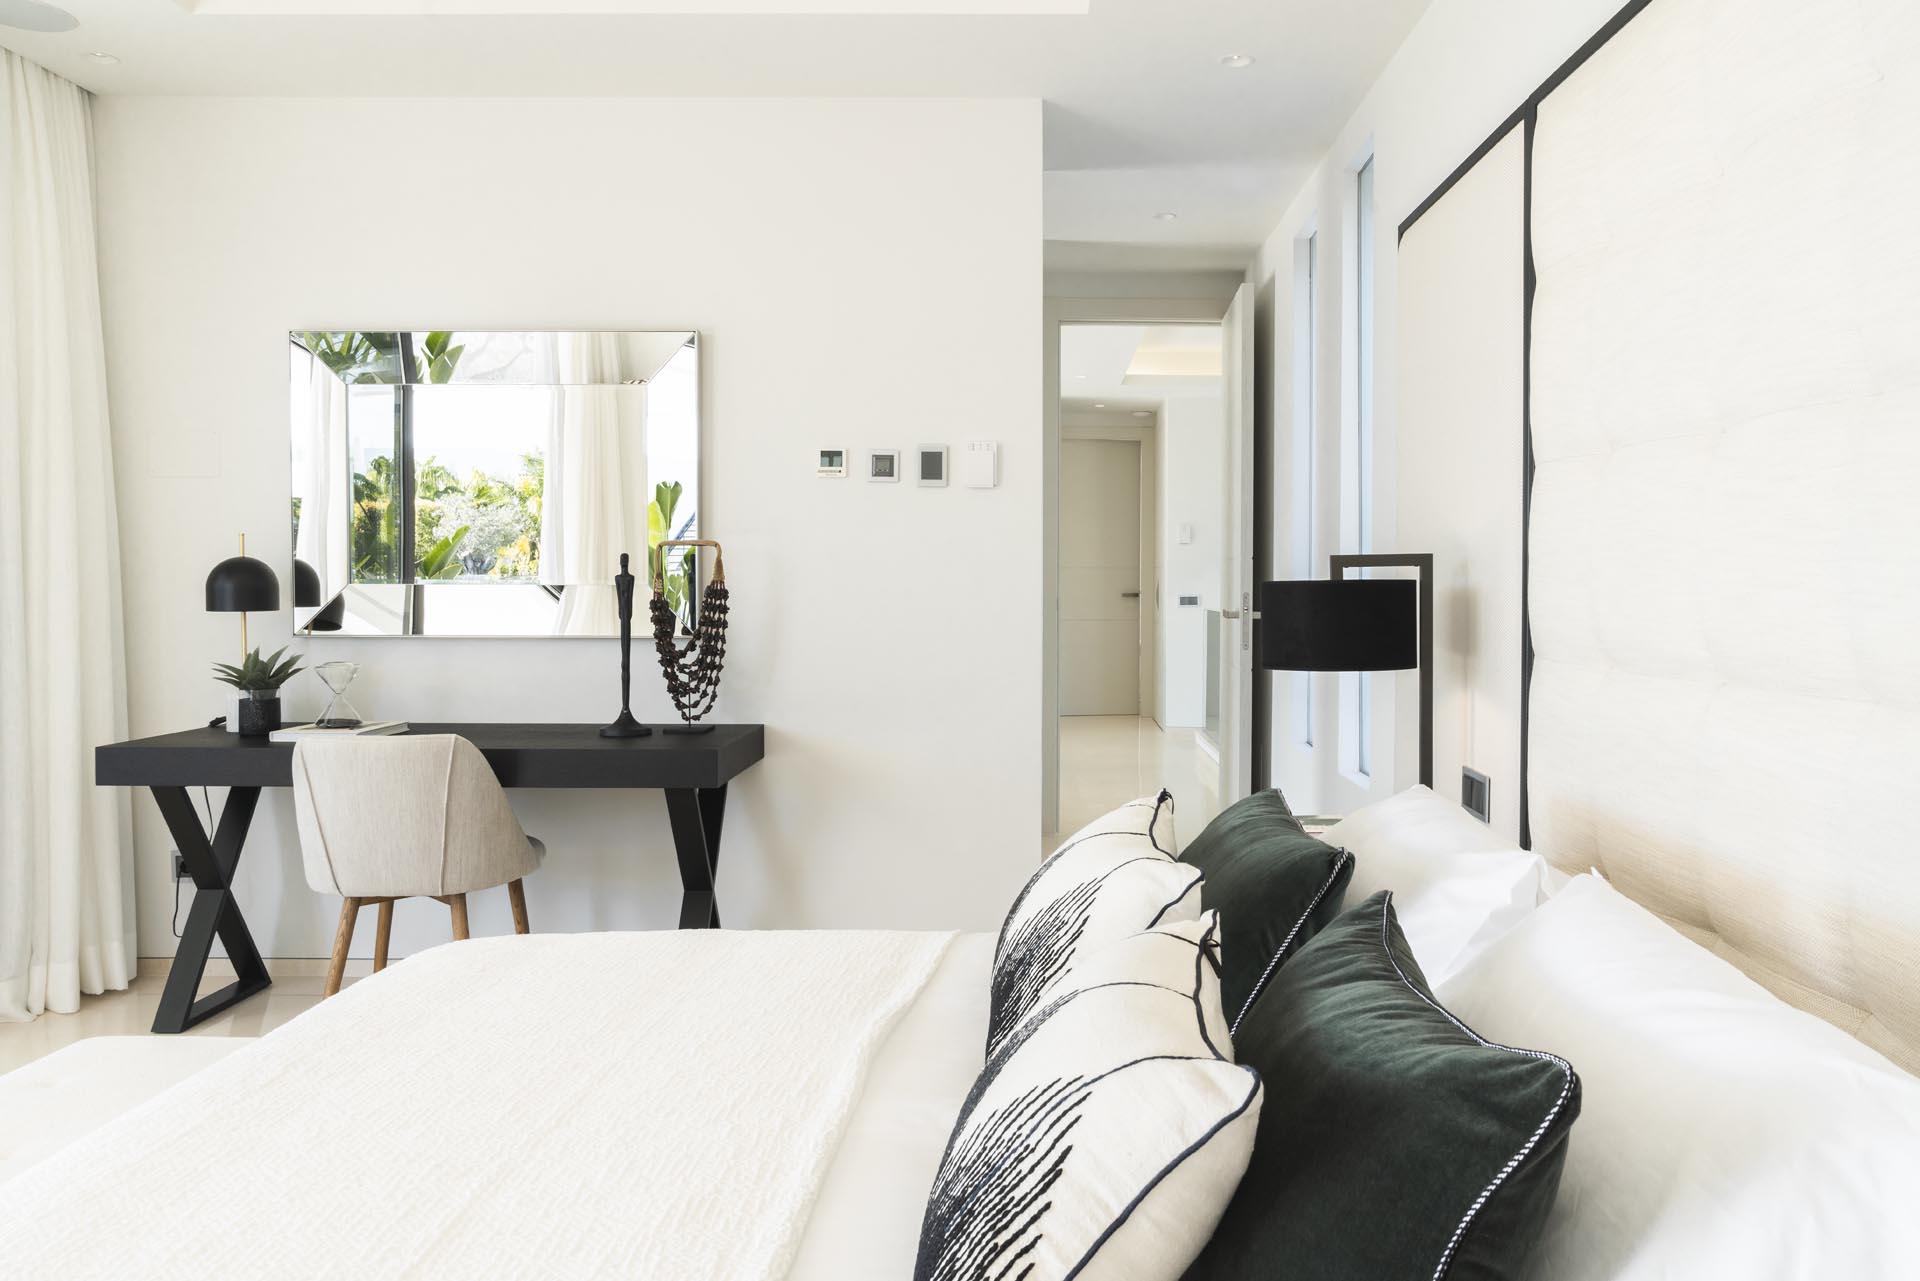 interiorista marbella villa dormitorio vista